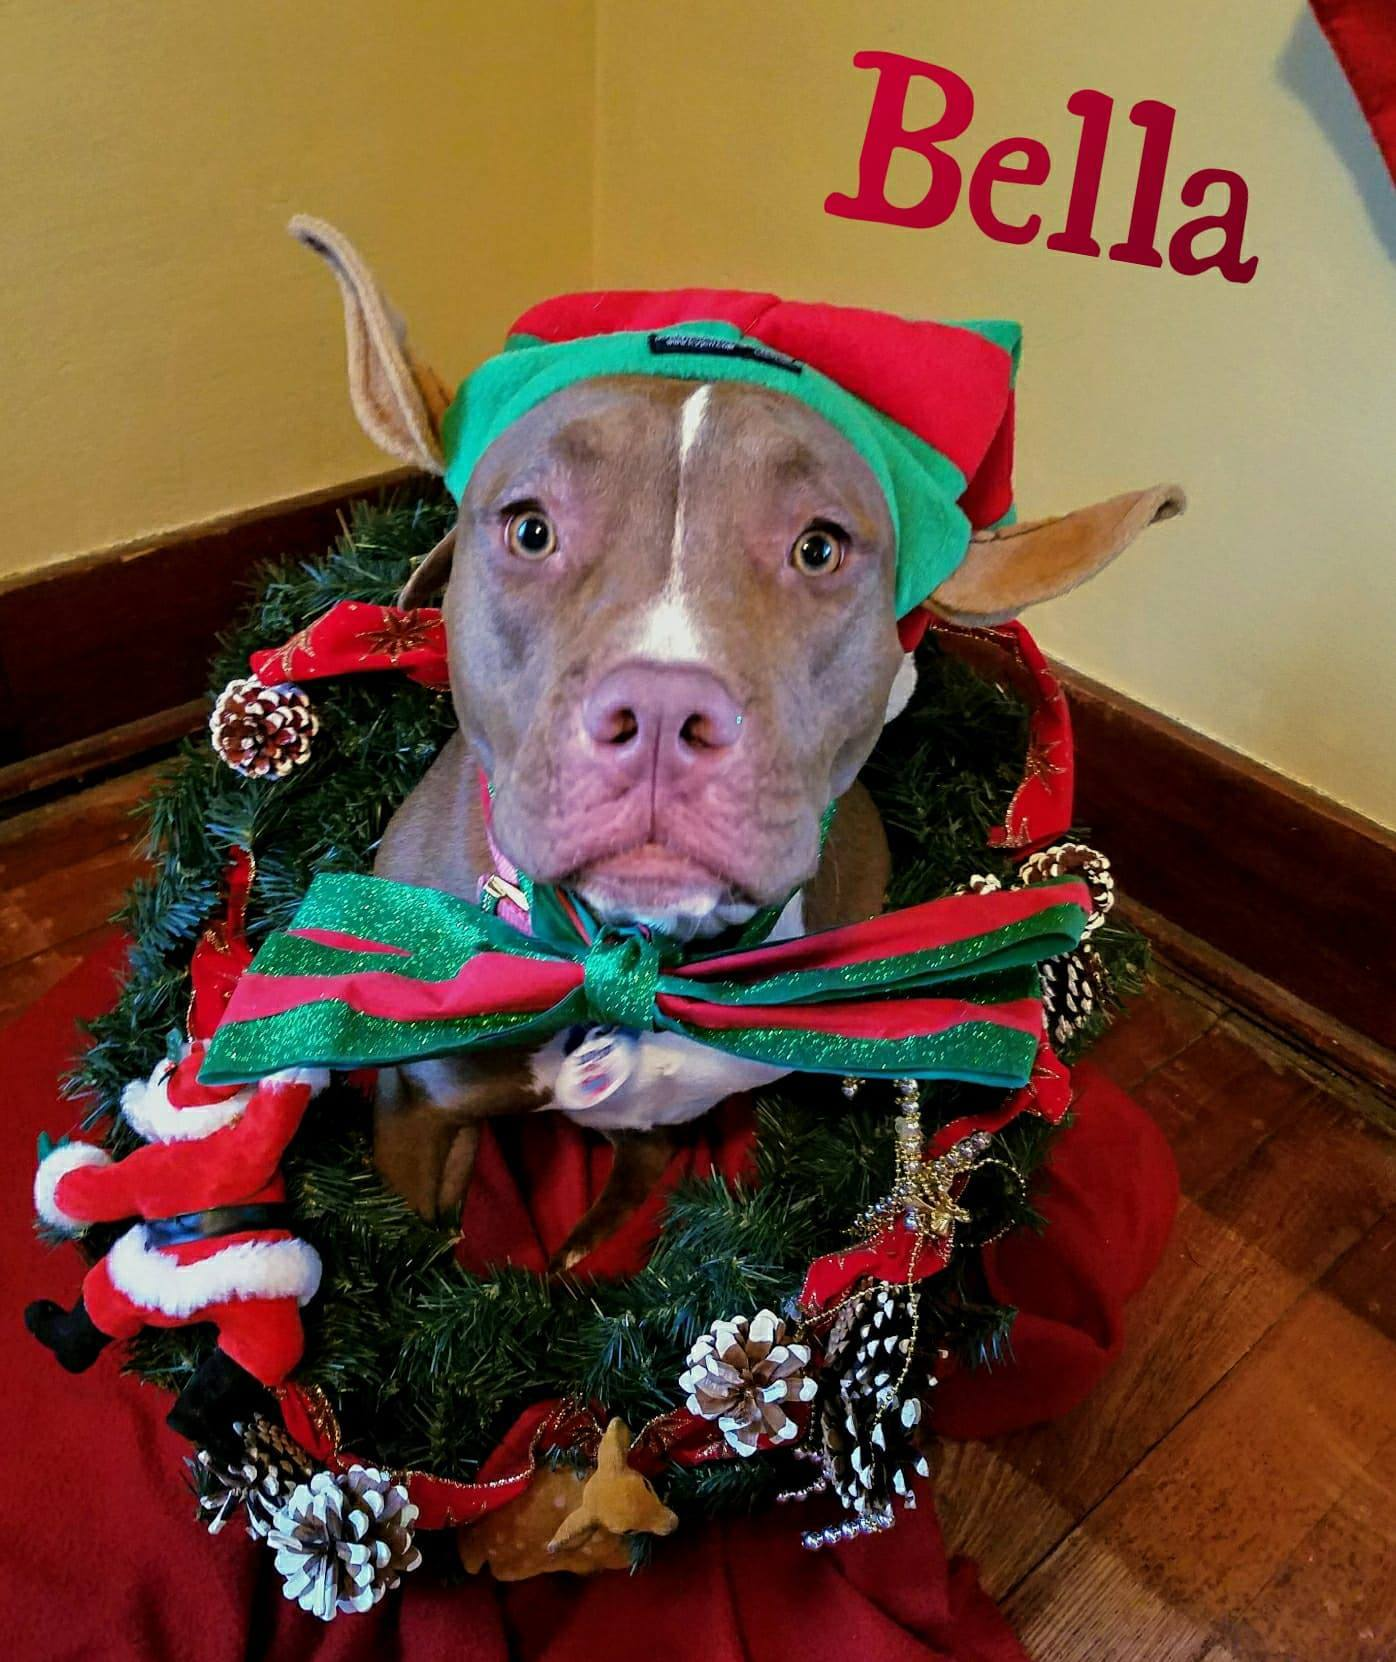 Bella-ADOPTION PENDING!!